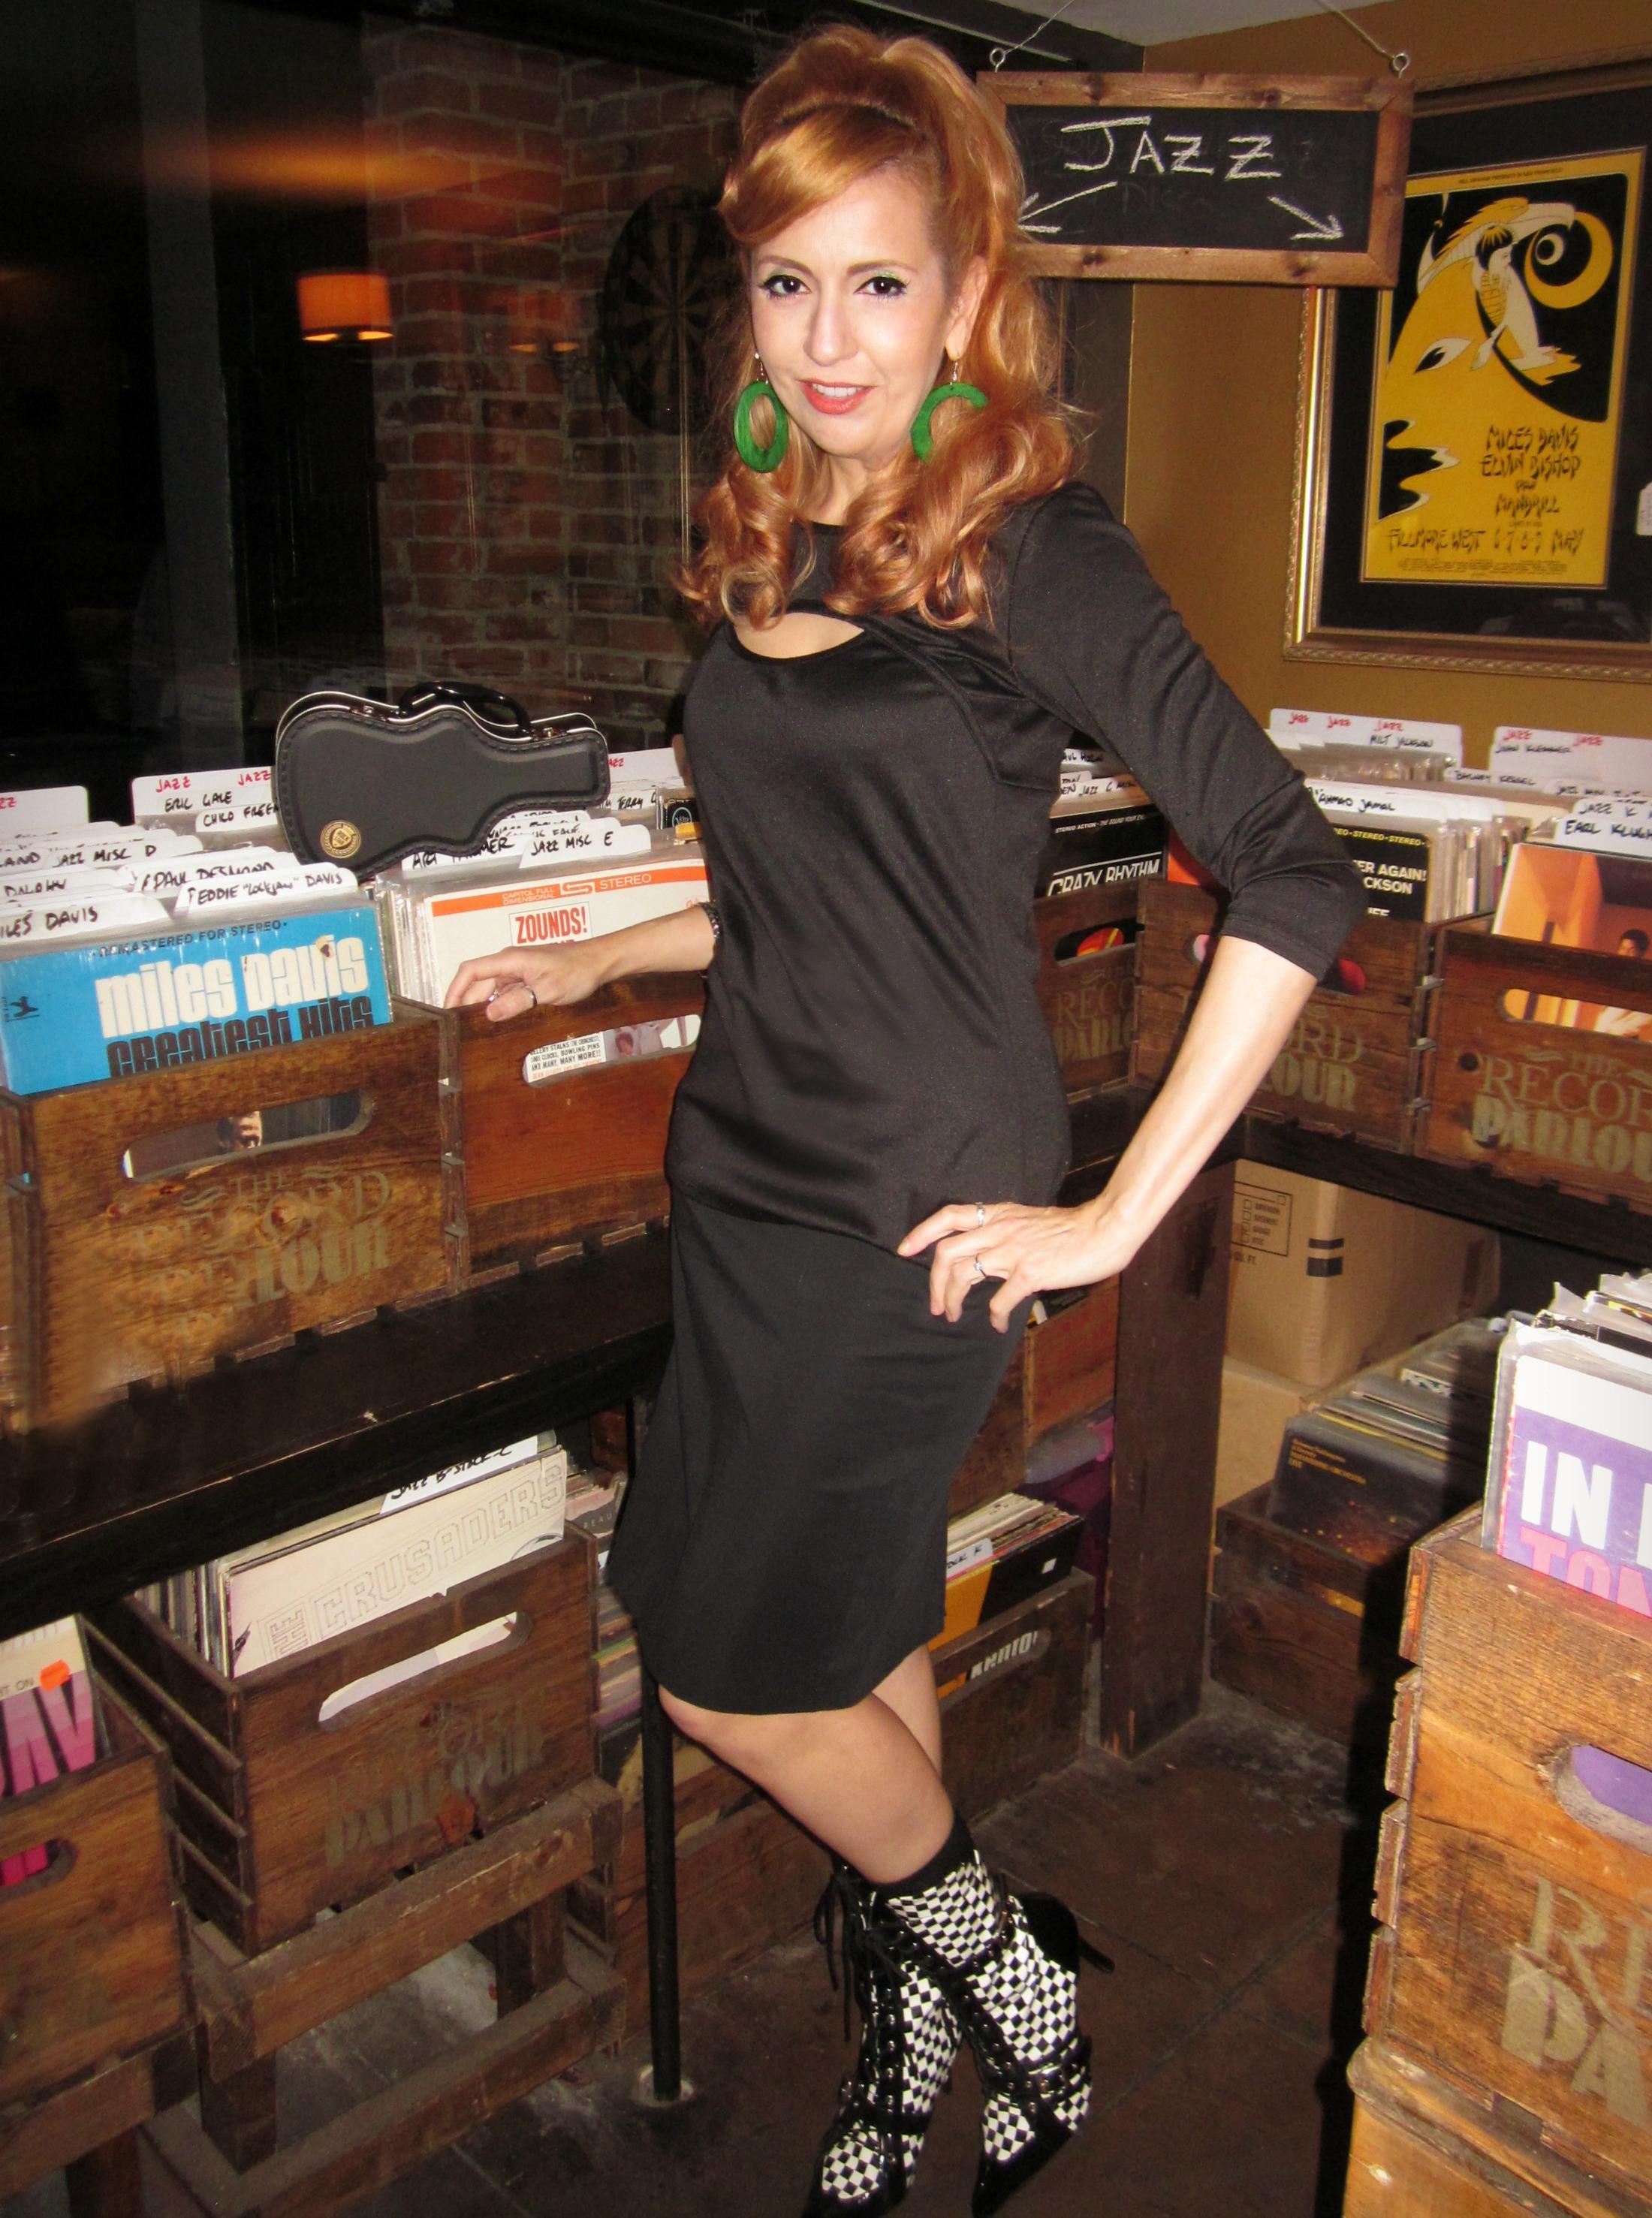 Stiletto City - Vinyl Shopping in Rocker Chic Style at the